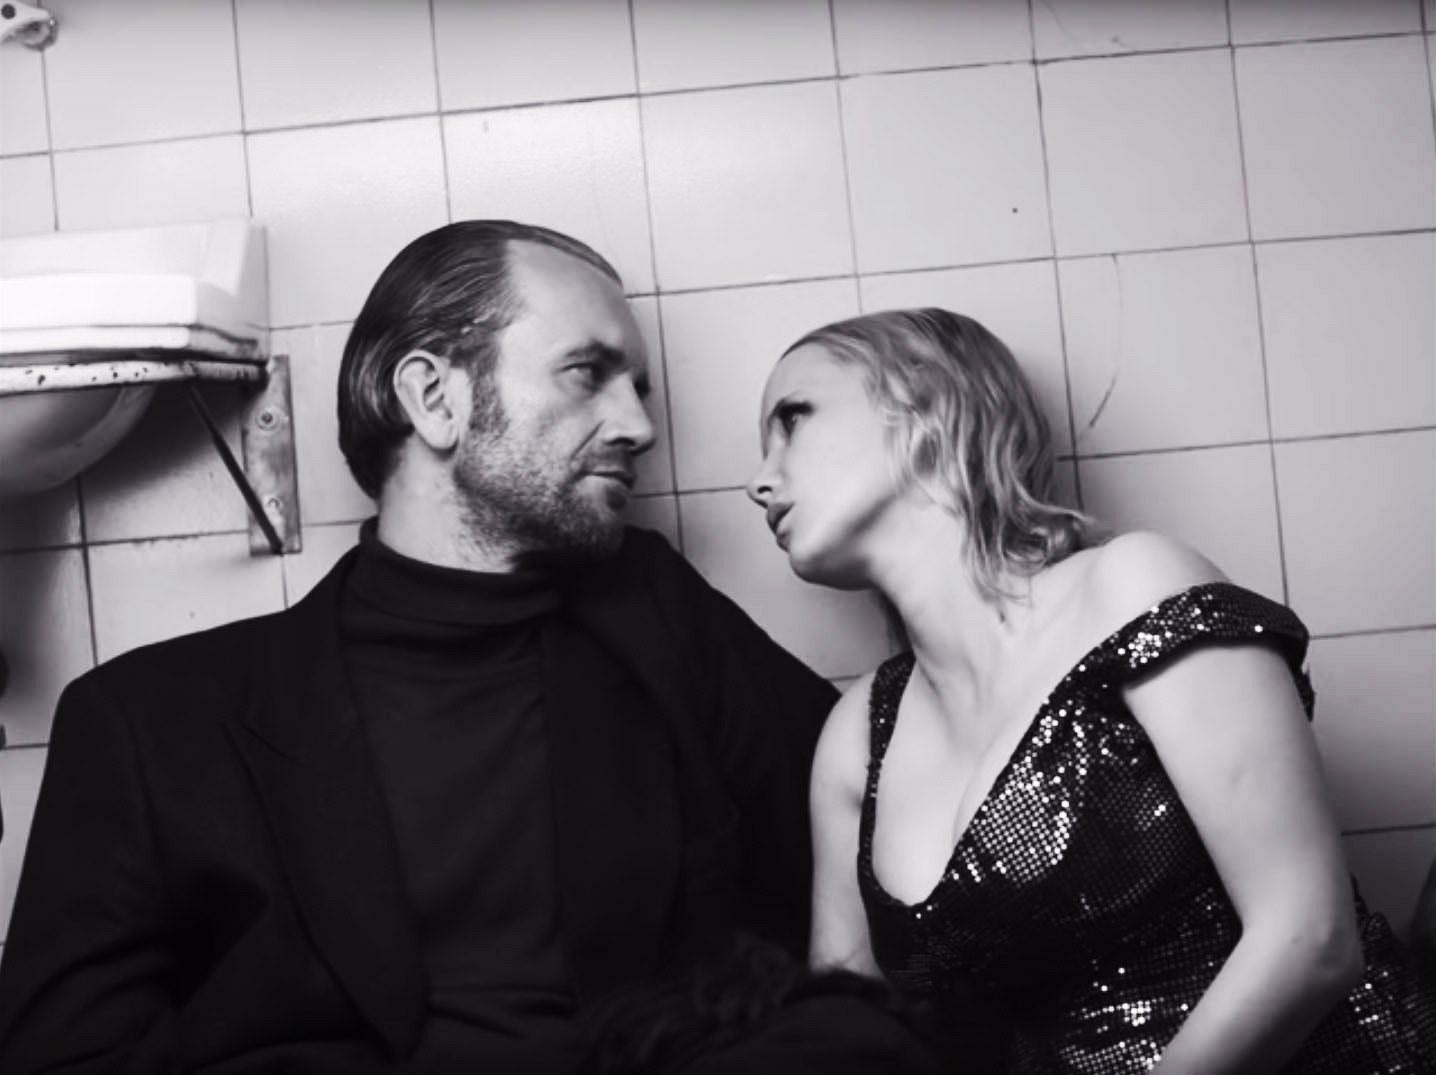 Tomasz Kot and Joanna Kulig lean against each other on the floor of a bathroom